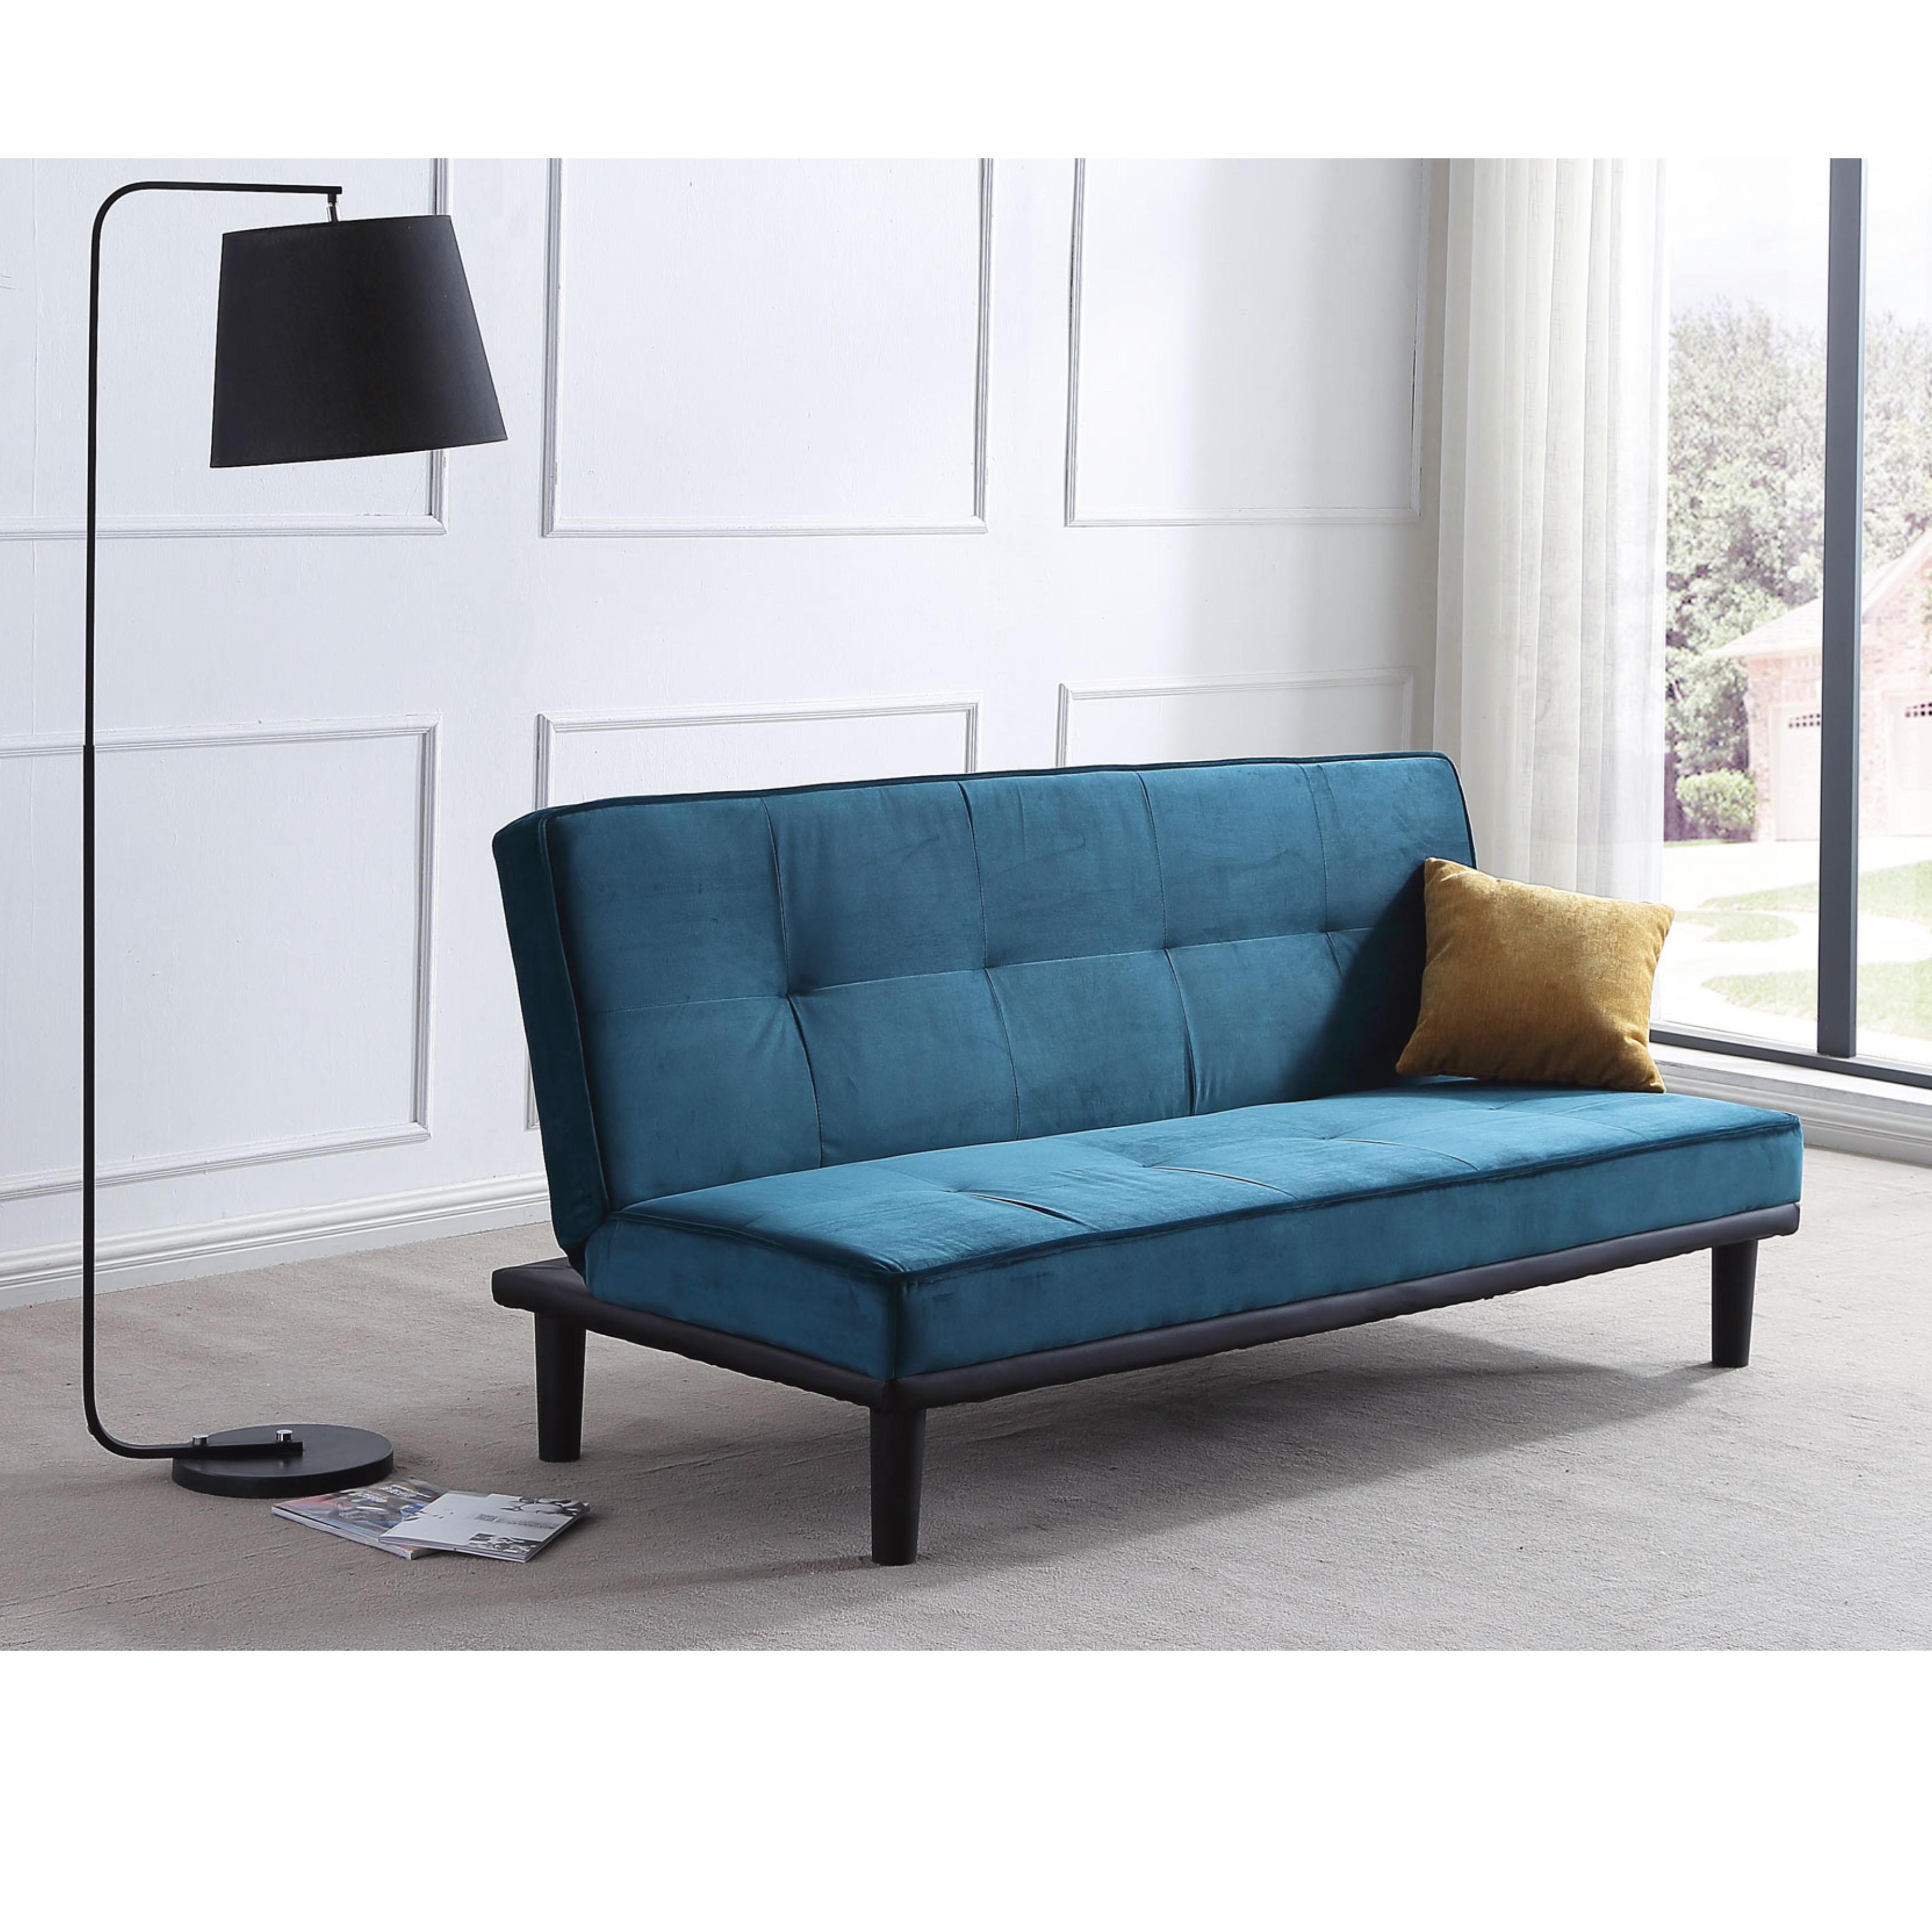 29536-sofa-cama-click-verde-aguamarina-1.jpeg